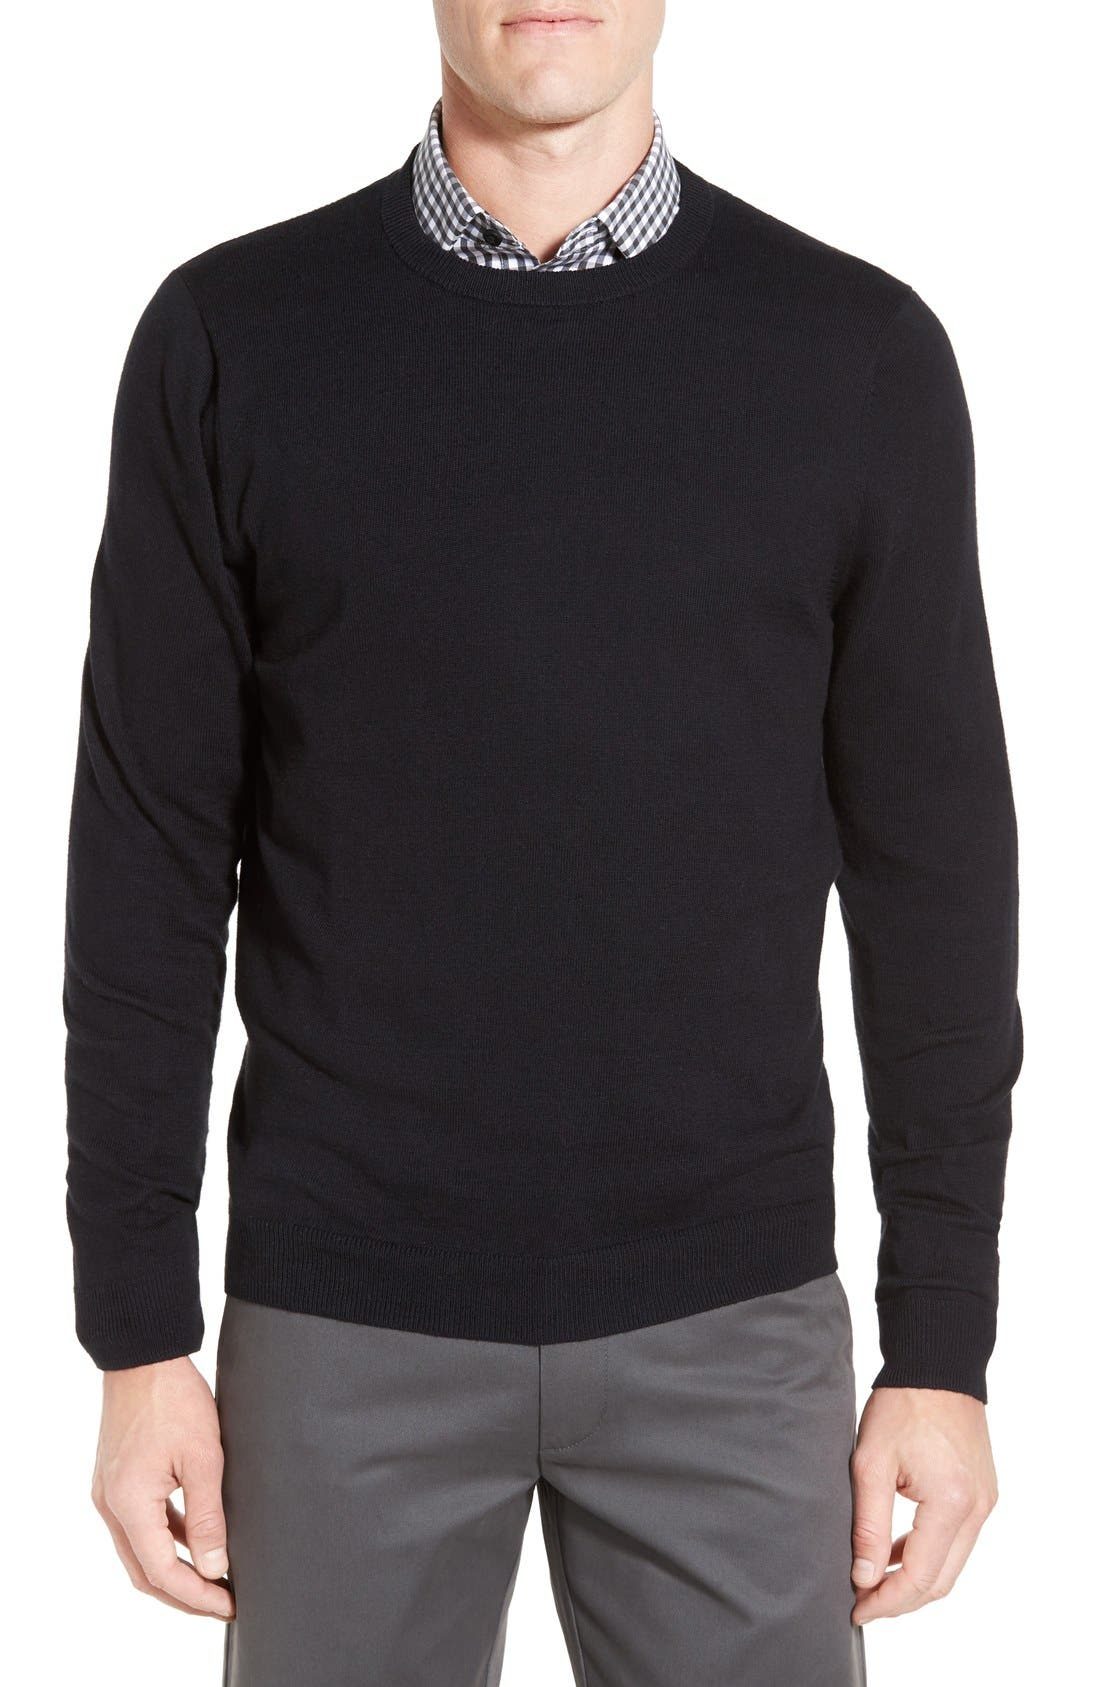 Cotton & Cashmere Crewneck Sweater,                             Main thumbnail 1, color,                             Black Caviar